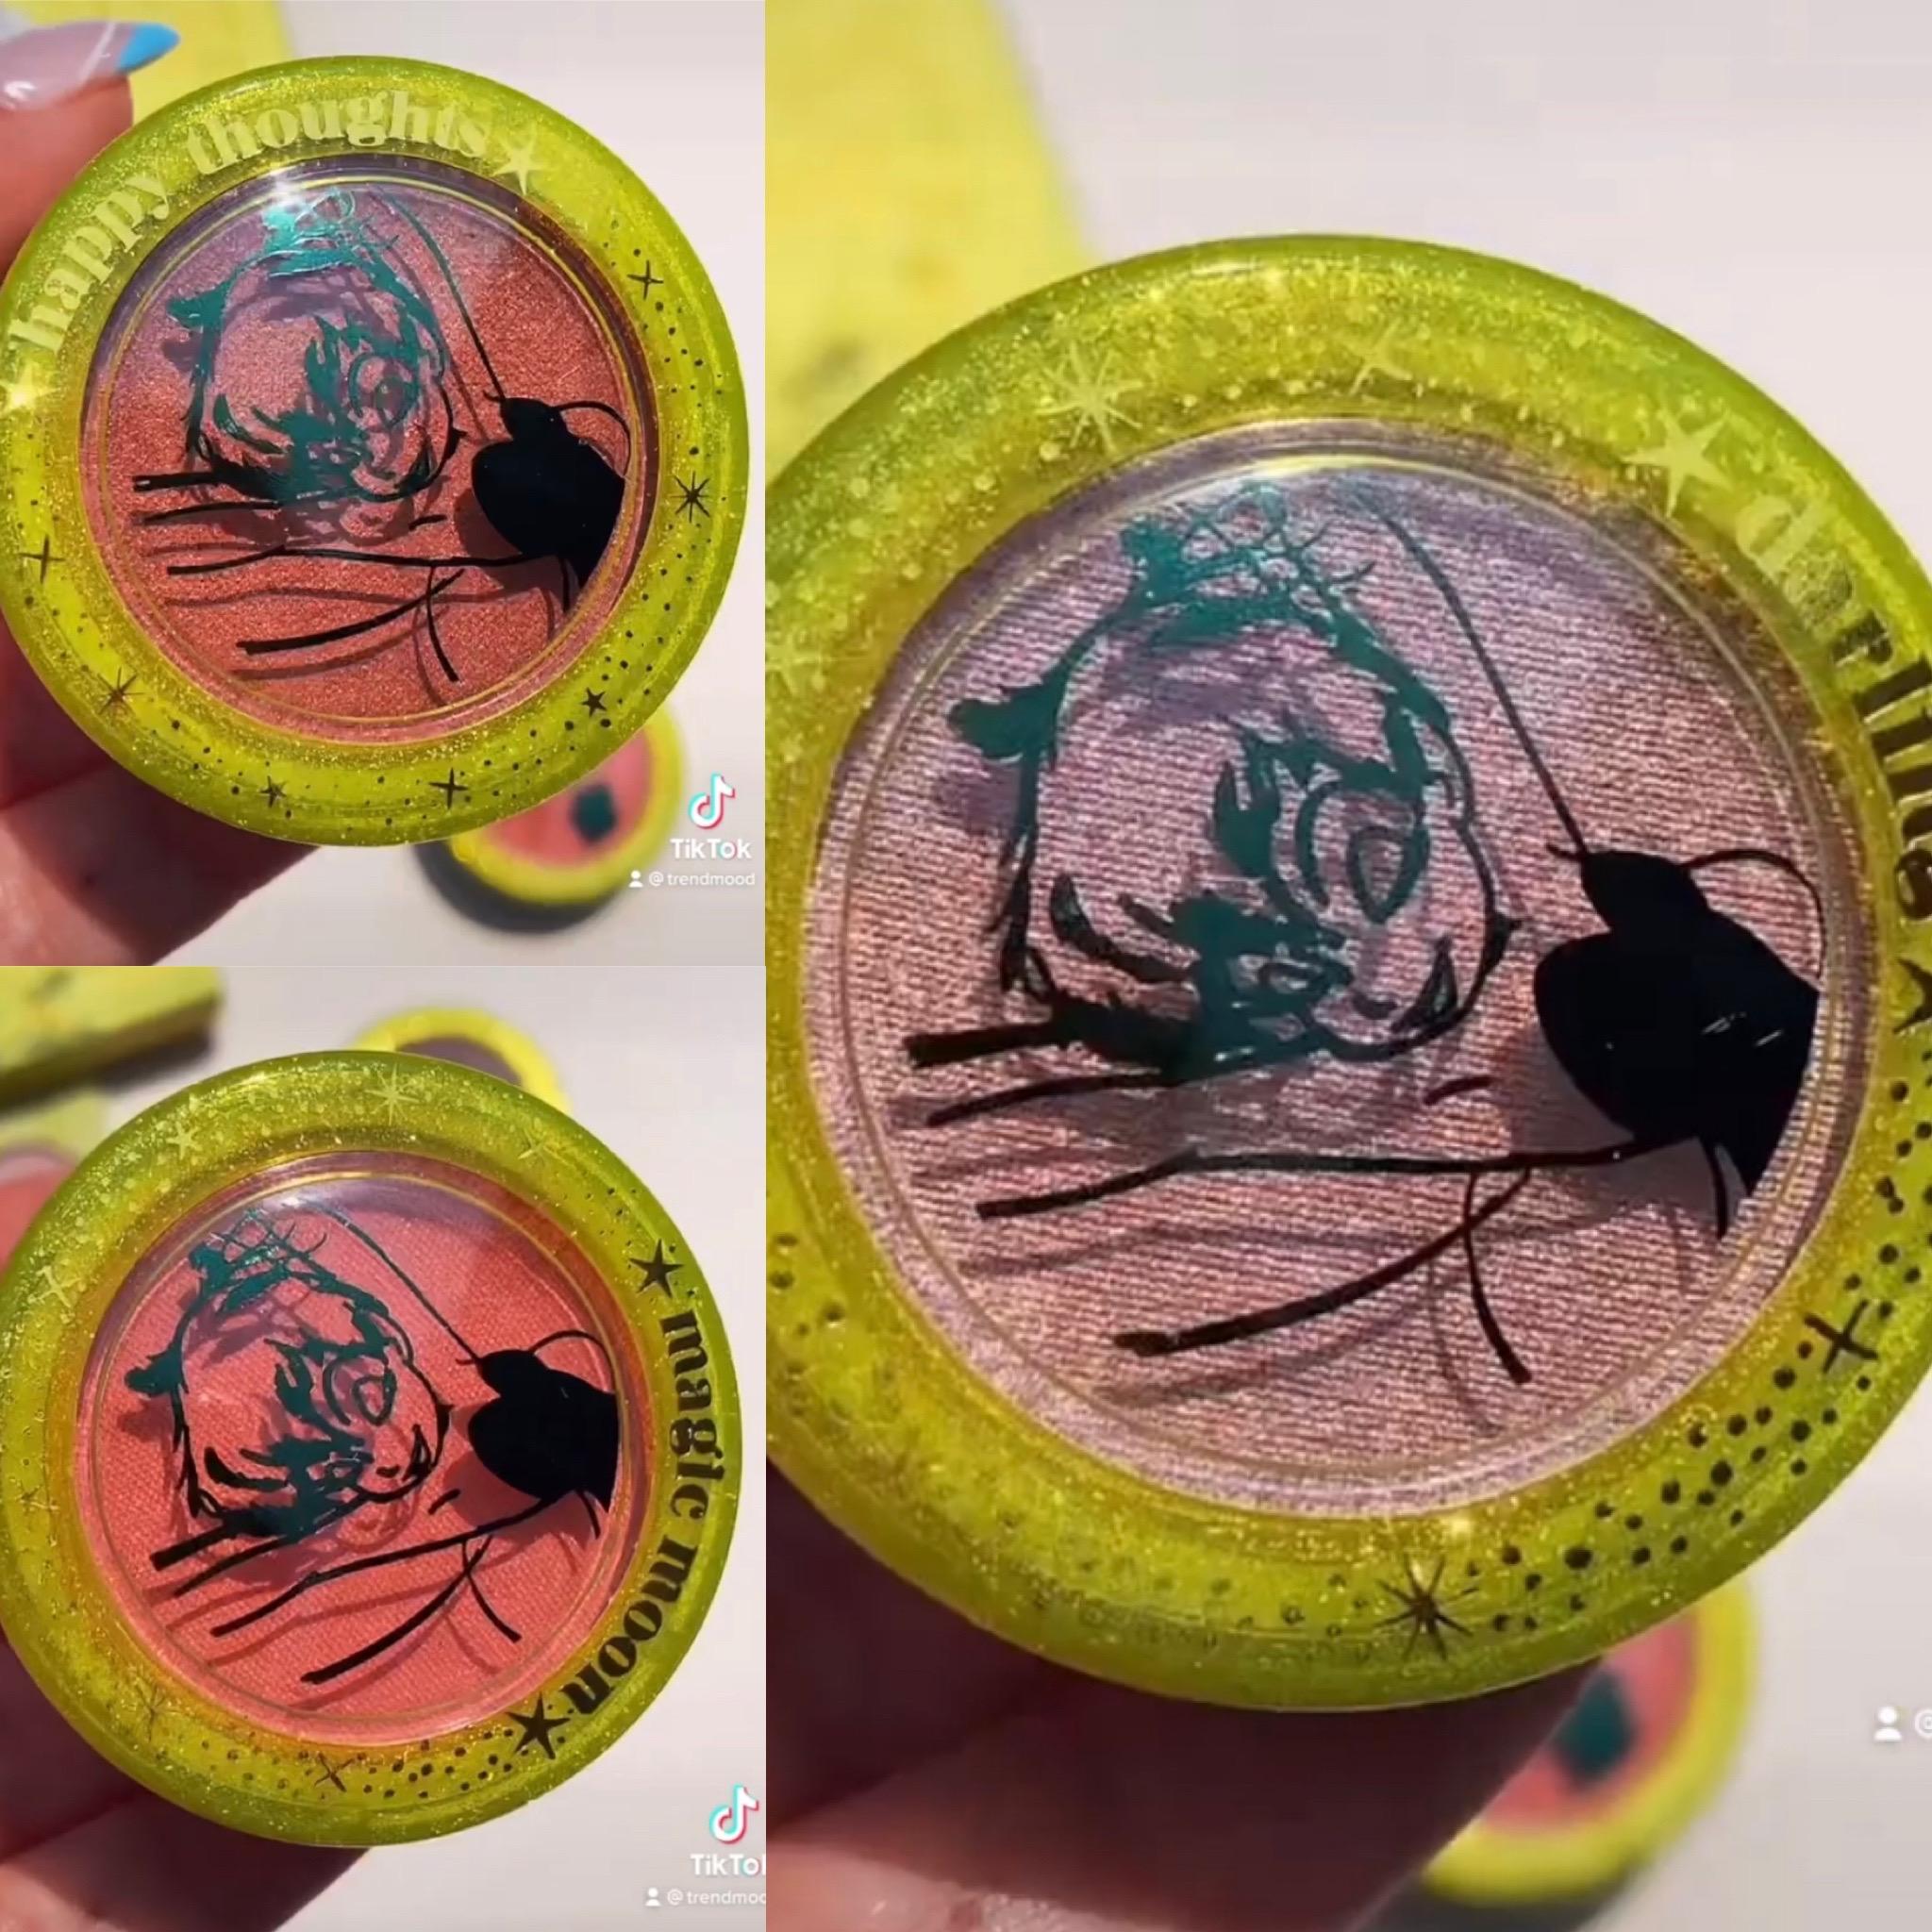 ColourPop x Disney Tinkerbell Collaboration Reveal!